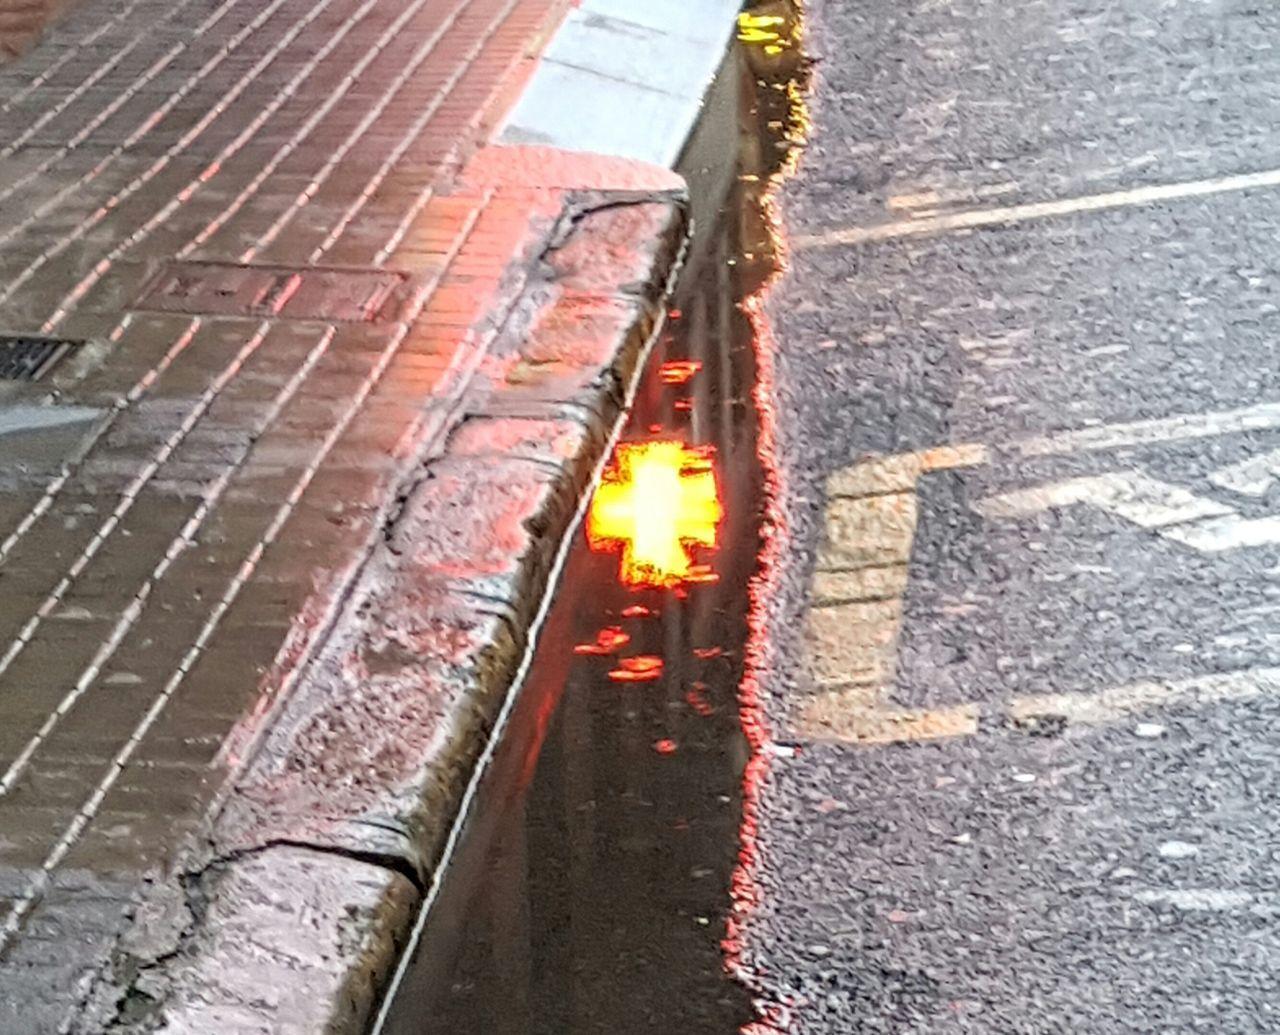 City Street Light Night Street Illuminated Road After Rain